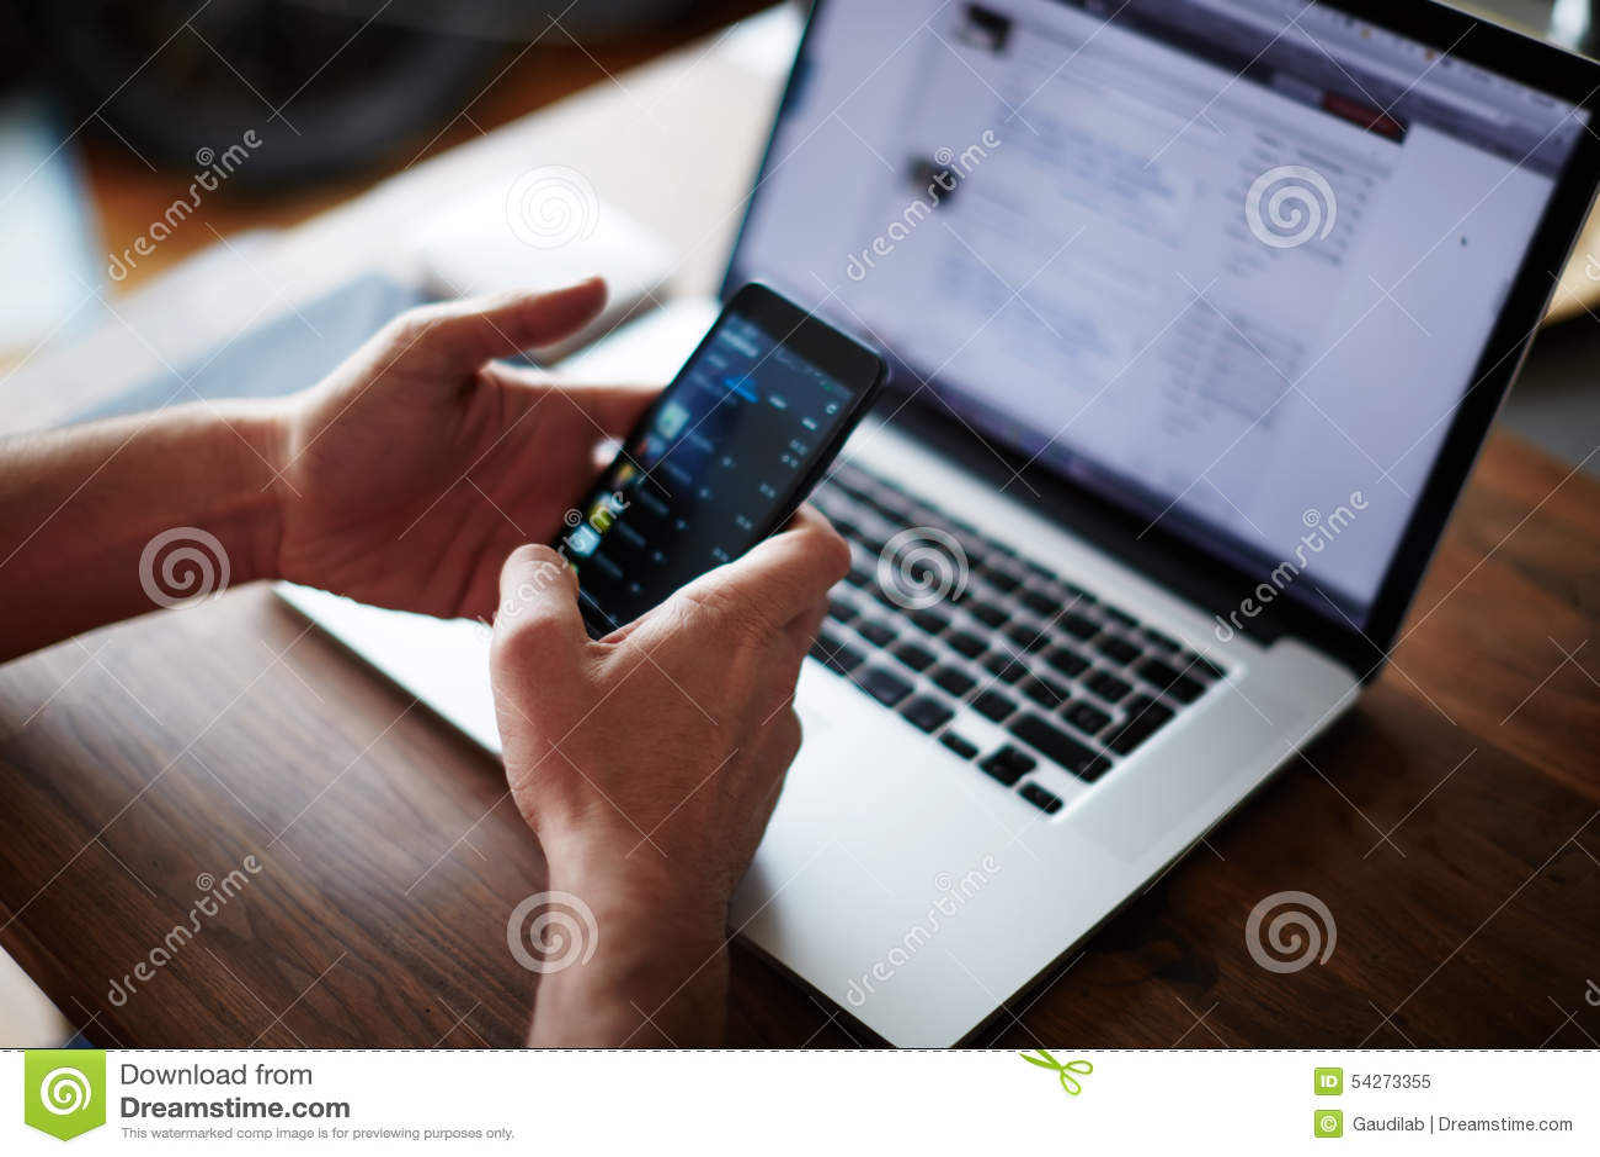 Technology Management Image: Businessman Using Technology Sitting At Modern Loft Wooden